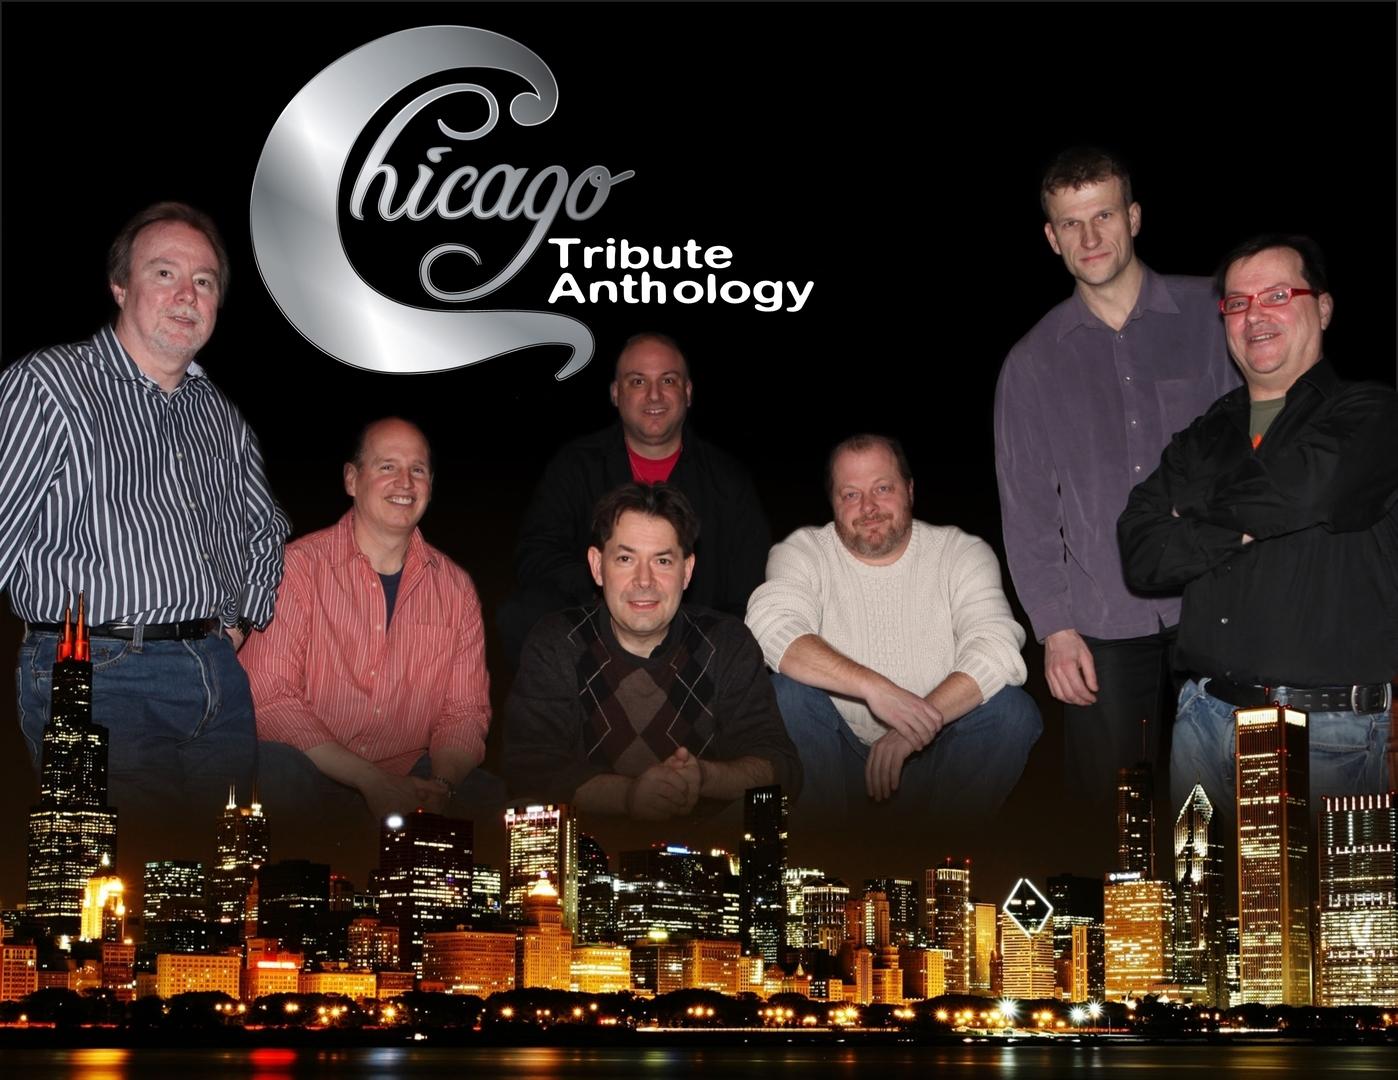 Animal Crackers Concert: Chicago Tribute Anthology